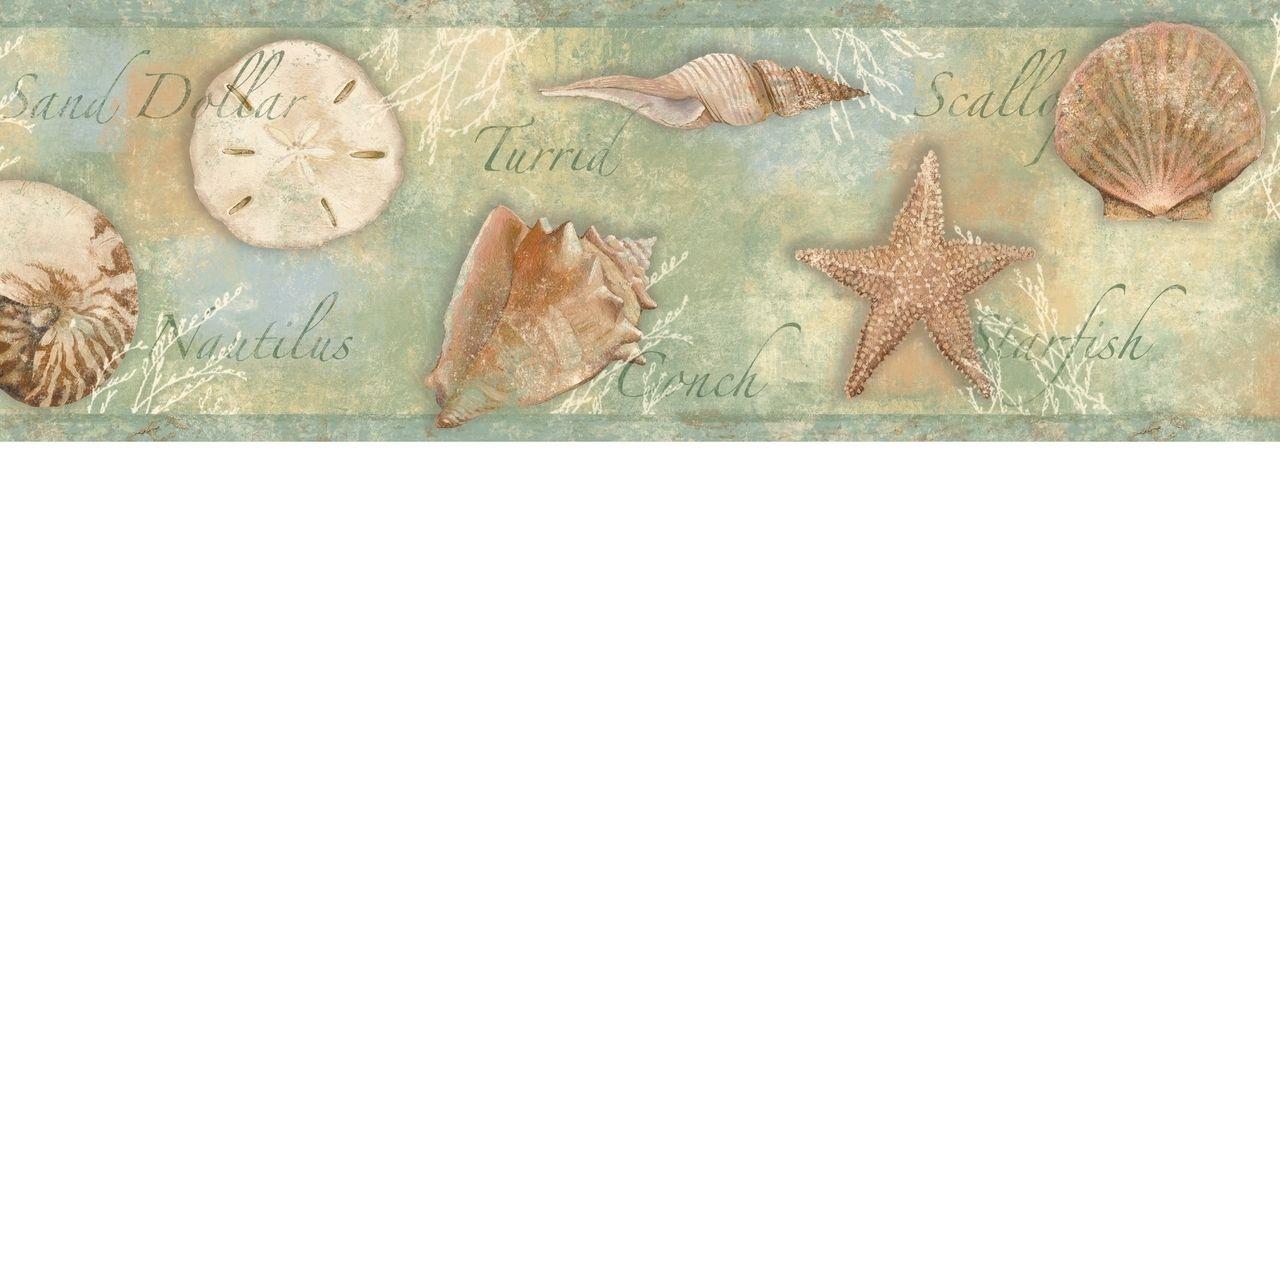 Seashells wallpaper 24 - Borders By Chesapeake Seashells Wallpaper Border Bbc46052b